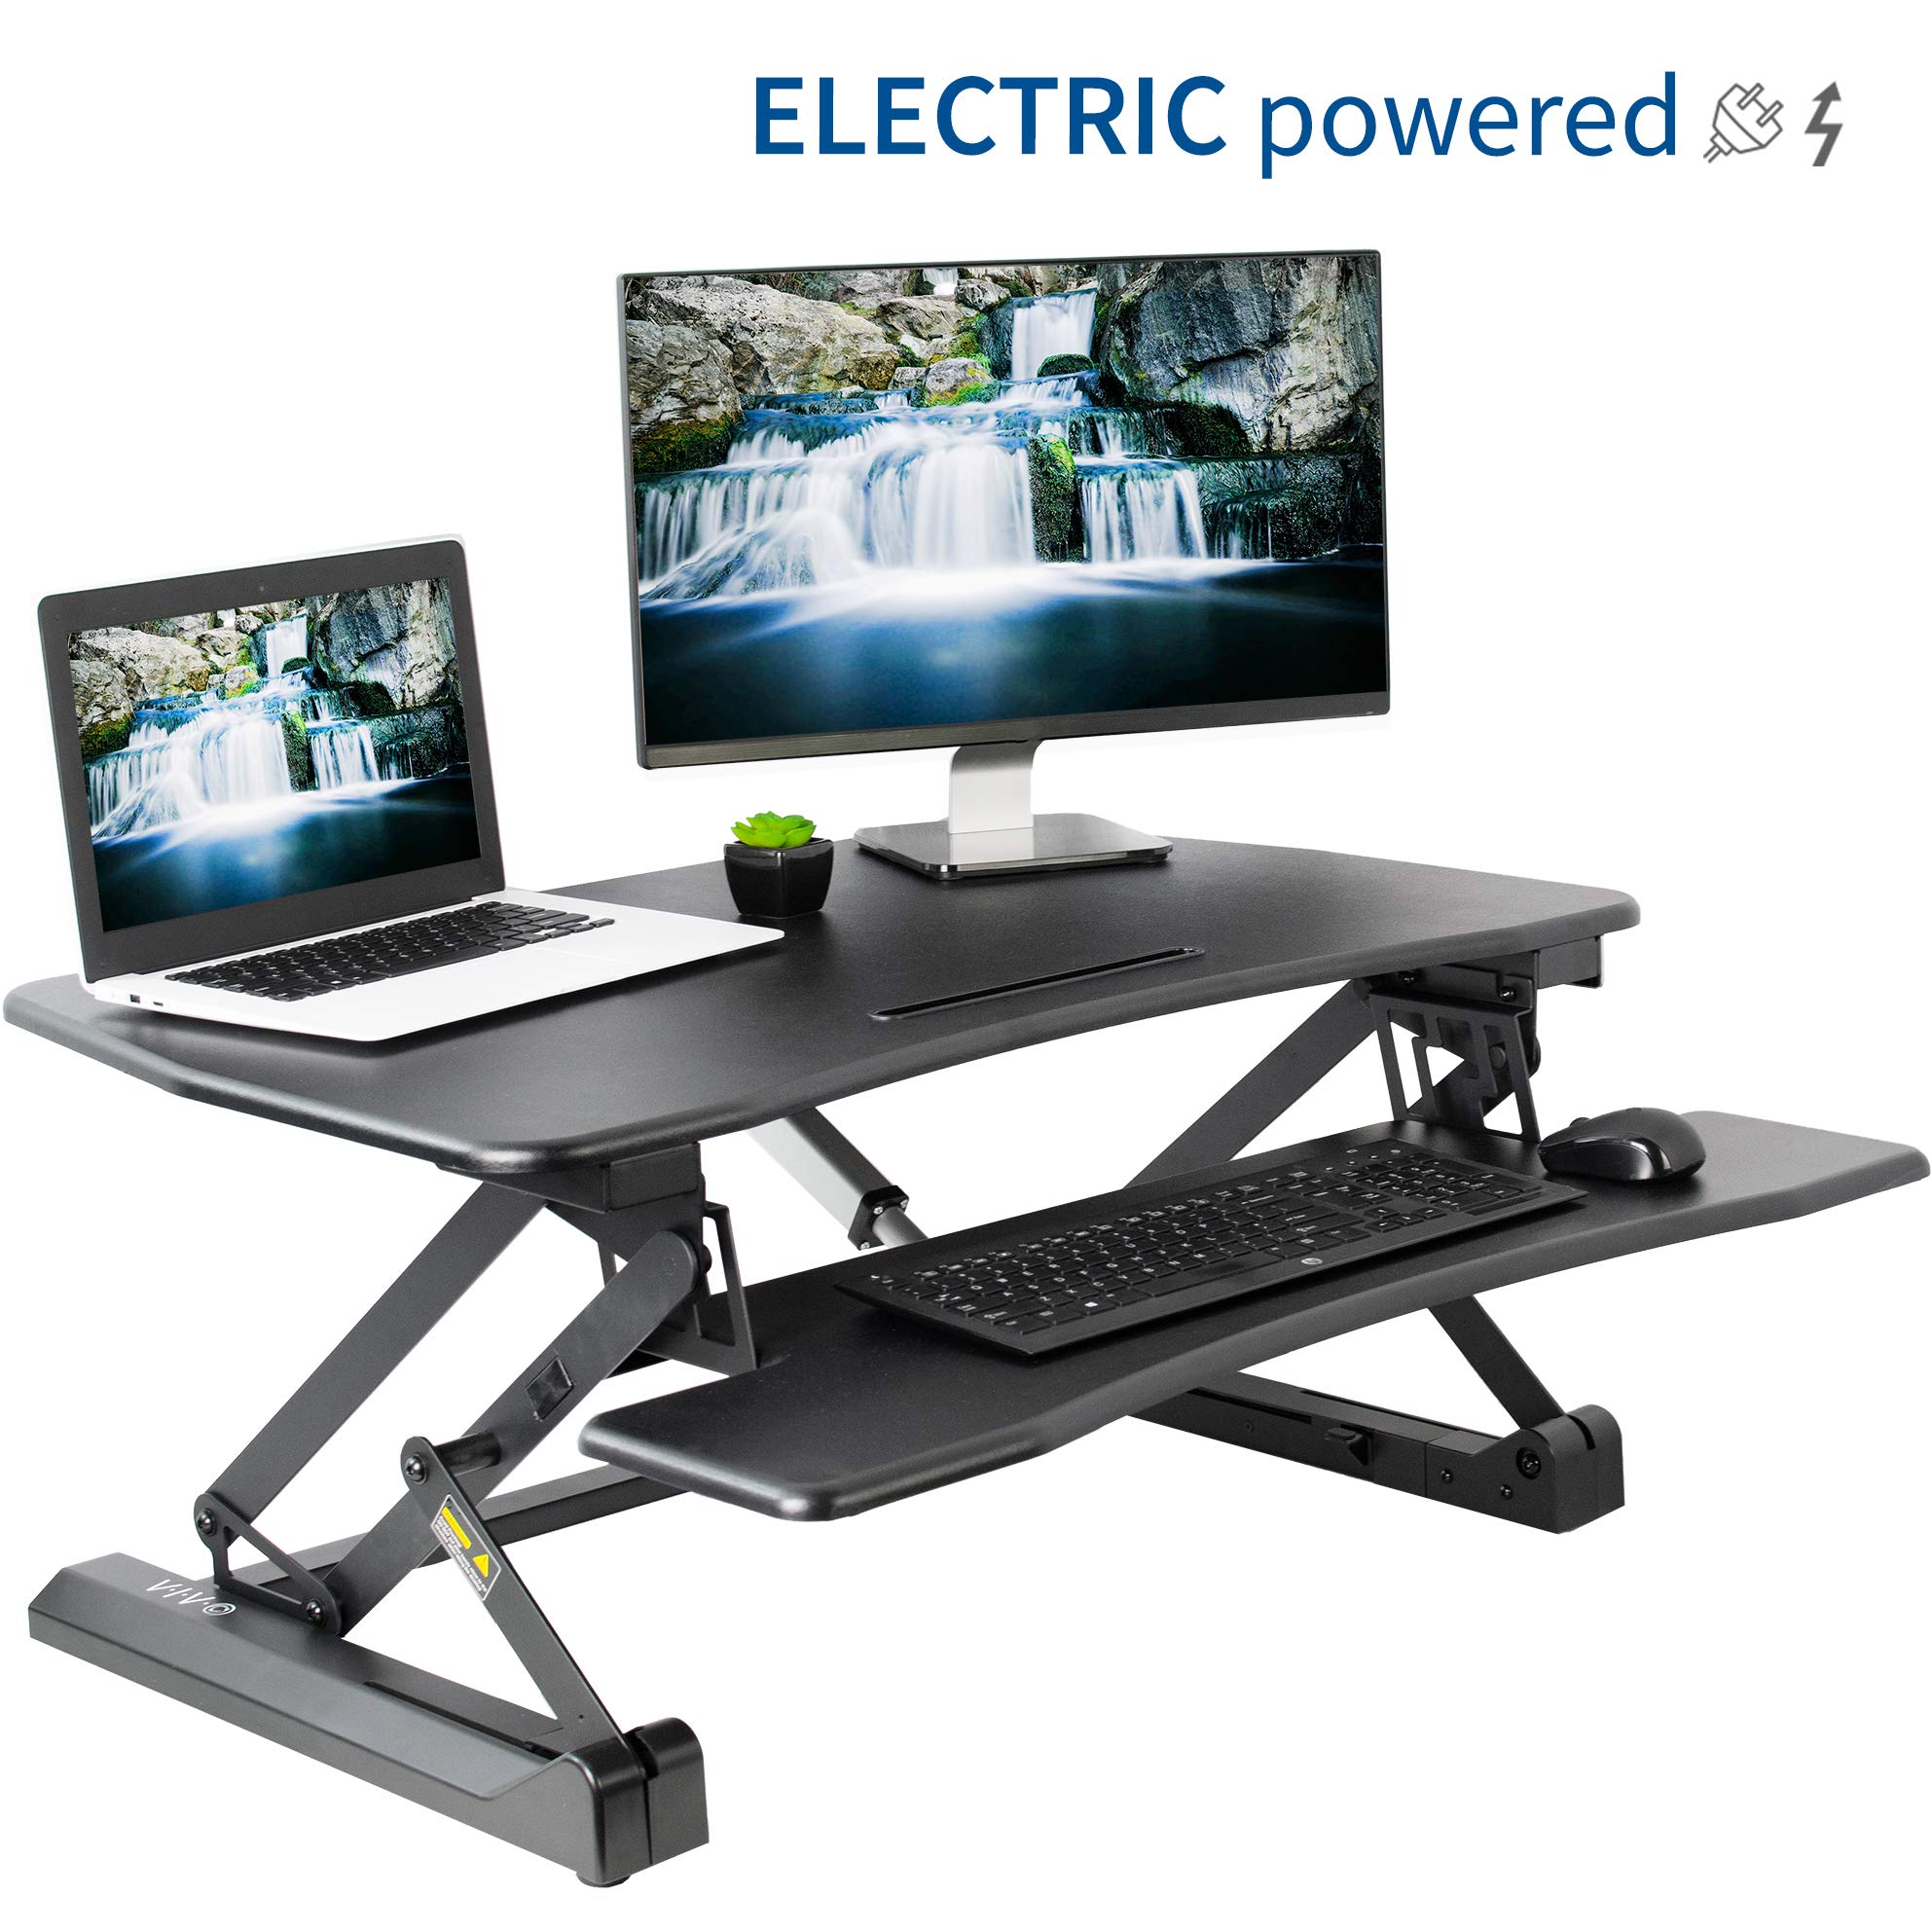 VIVO Electric Height Adjustable Standing Desk Converter - Sit to Stand Power Riser   36'' Black Tabletop Workstation fits Dual Monitor (DESK-V000EB)